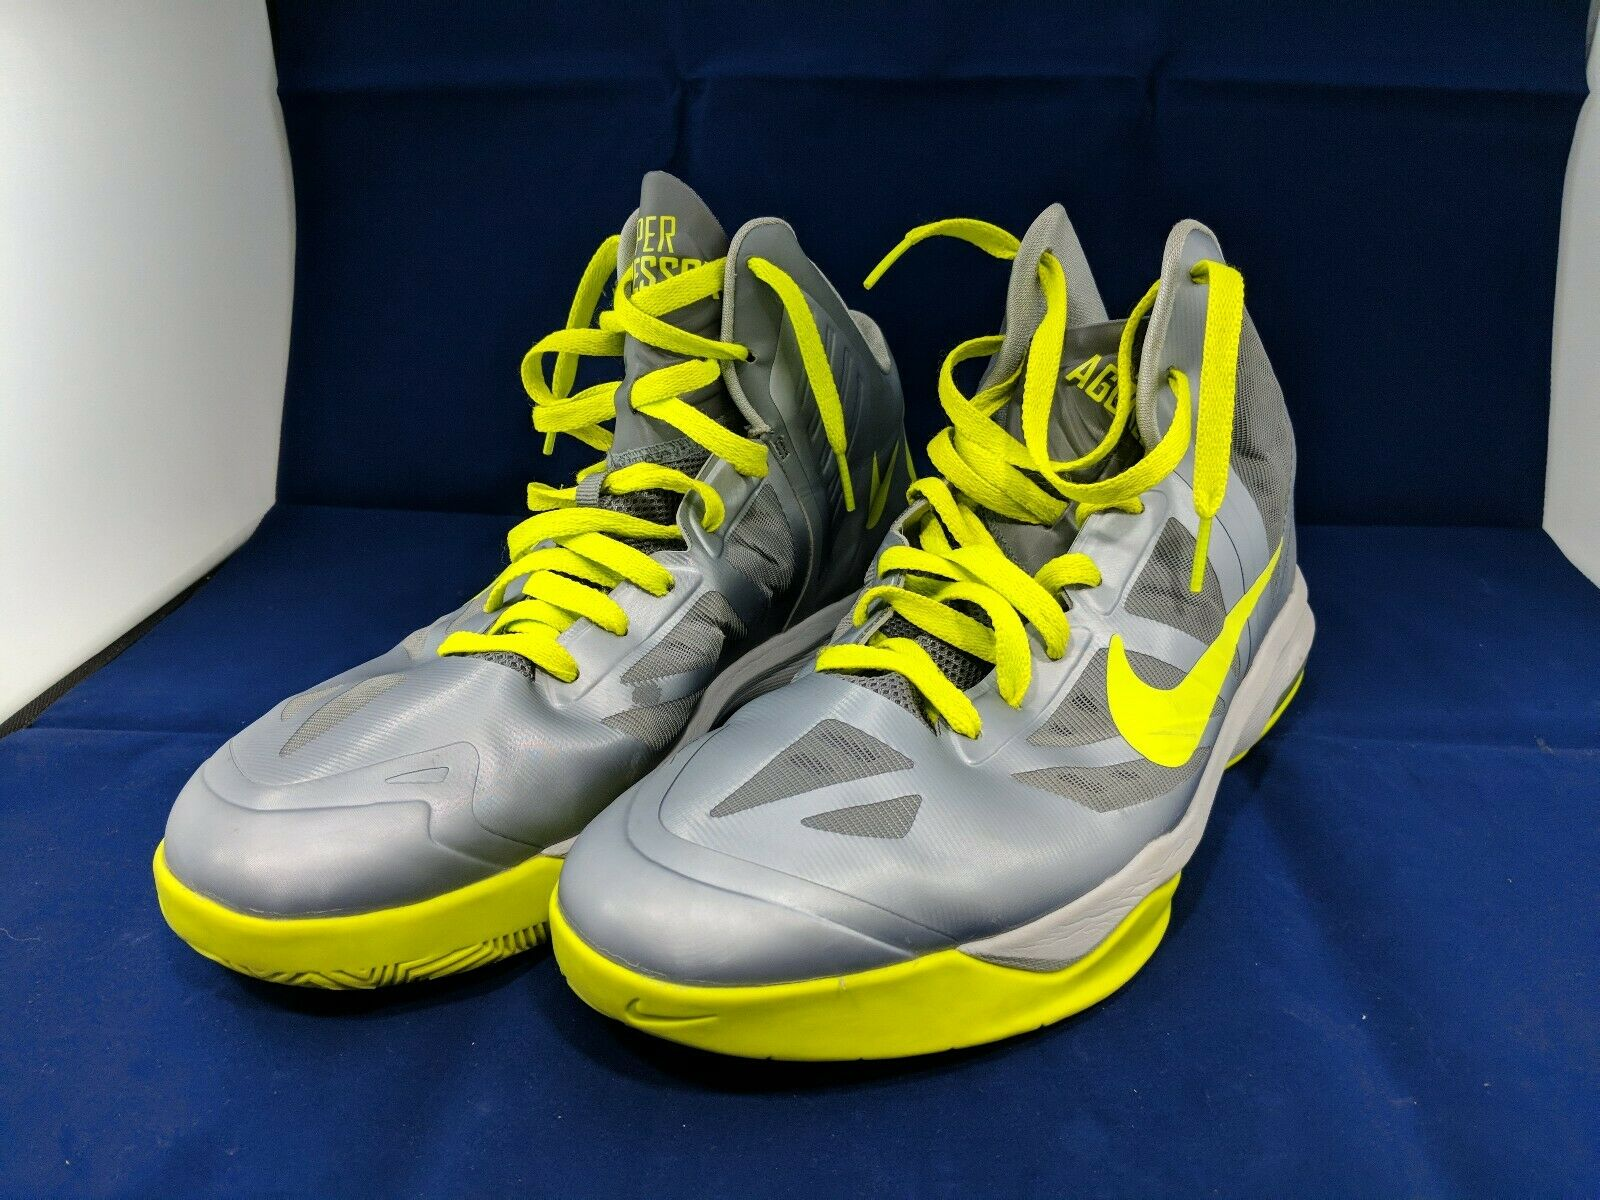 Nike Air Max Hyper Aggressor Men's 11.5 Basketball Shoes